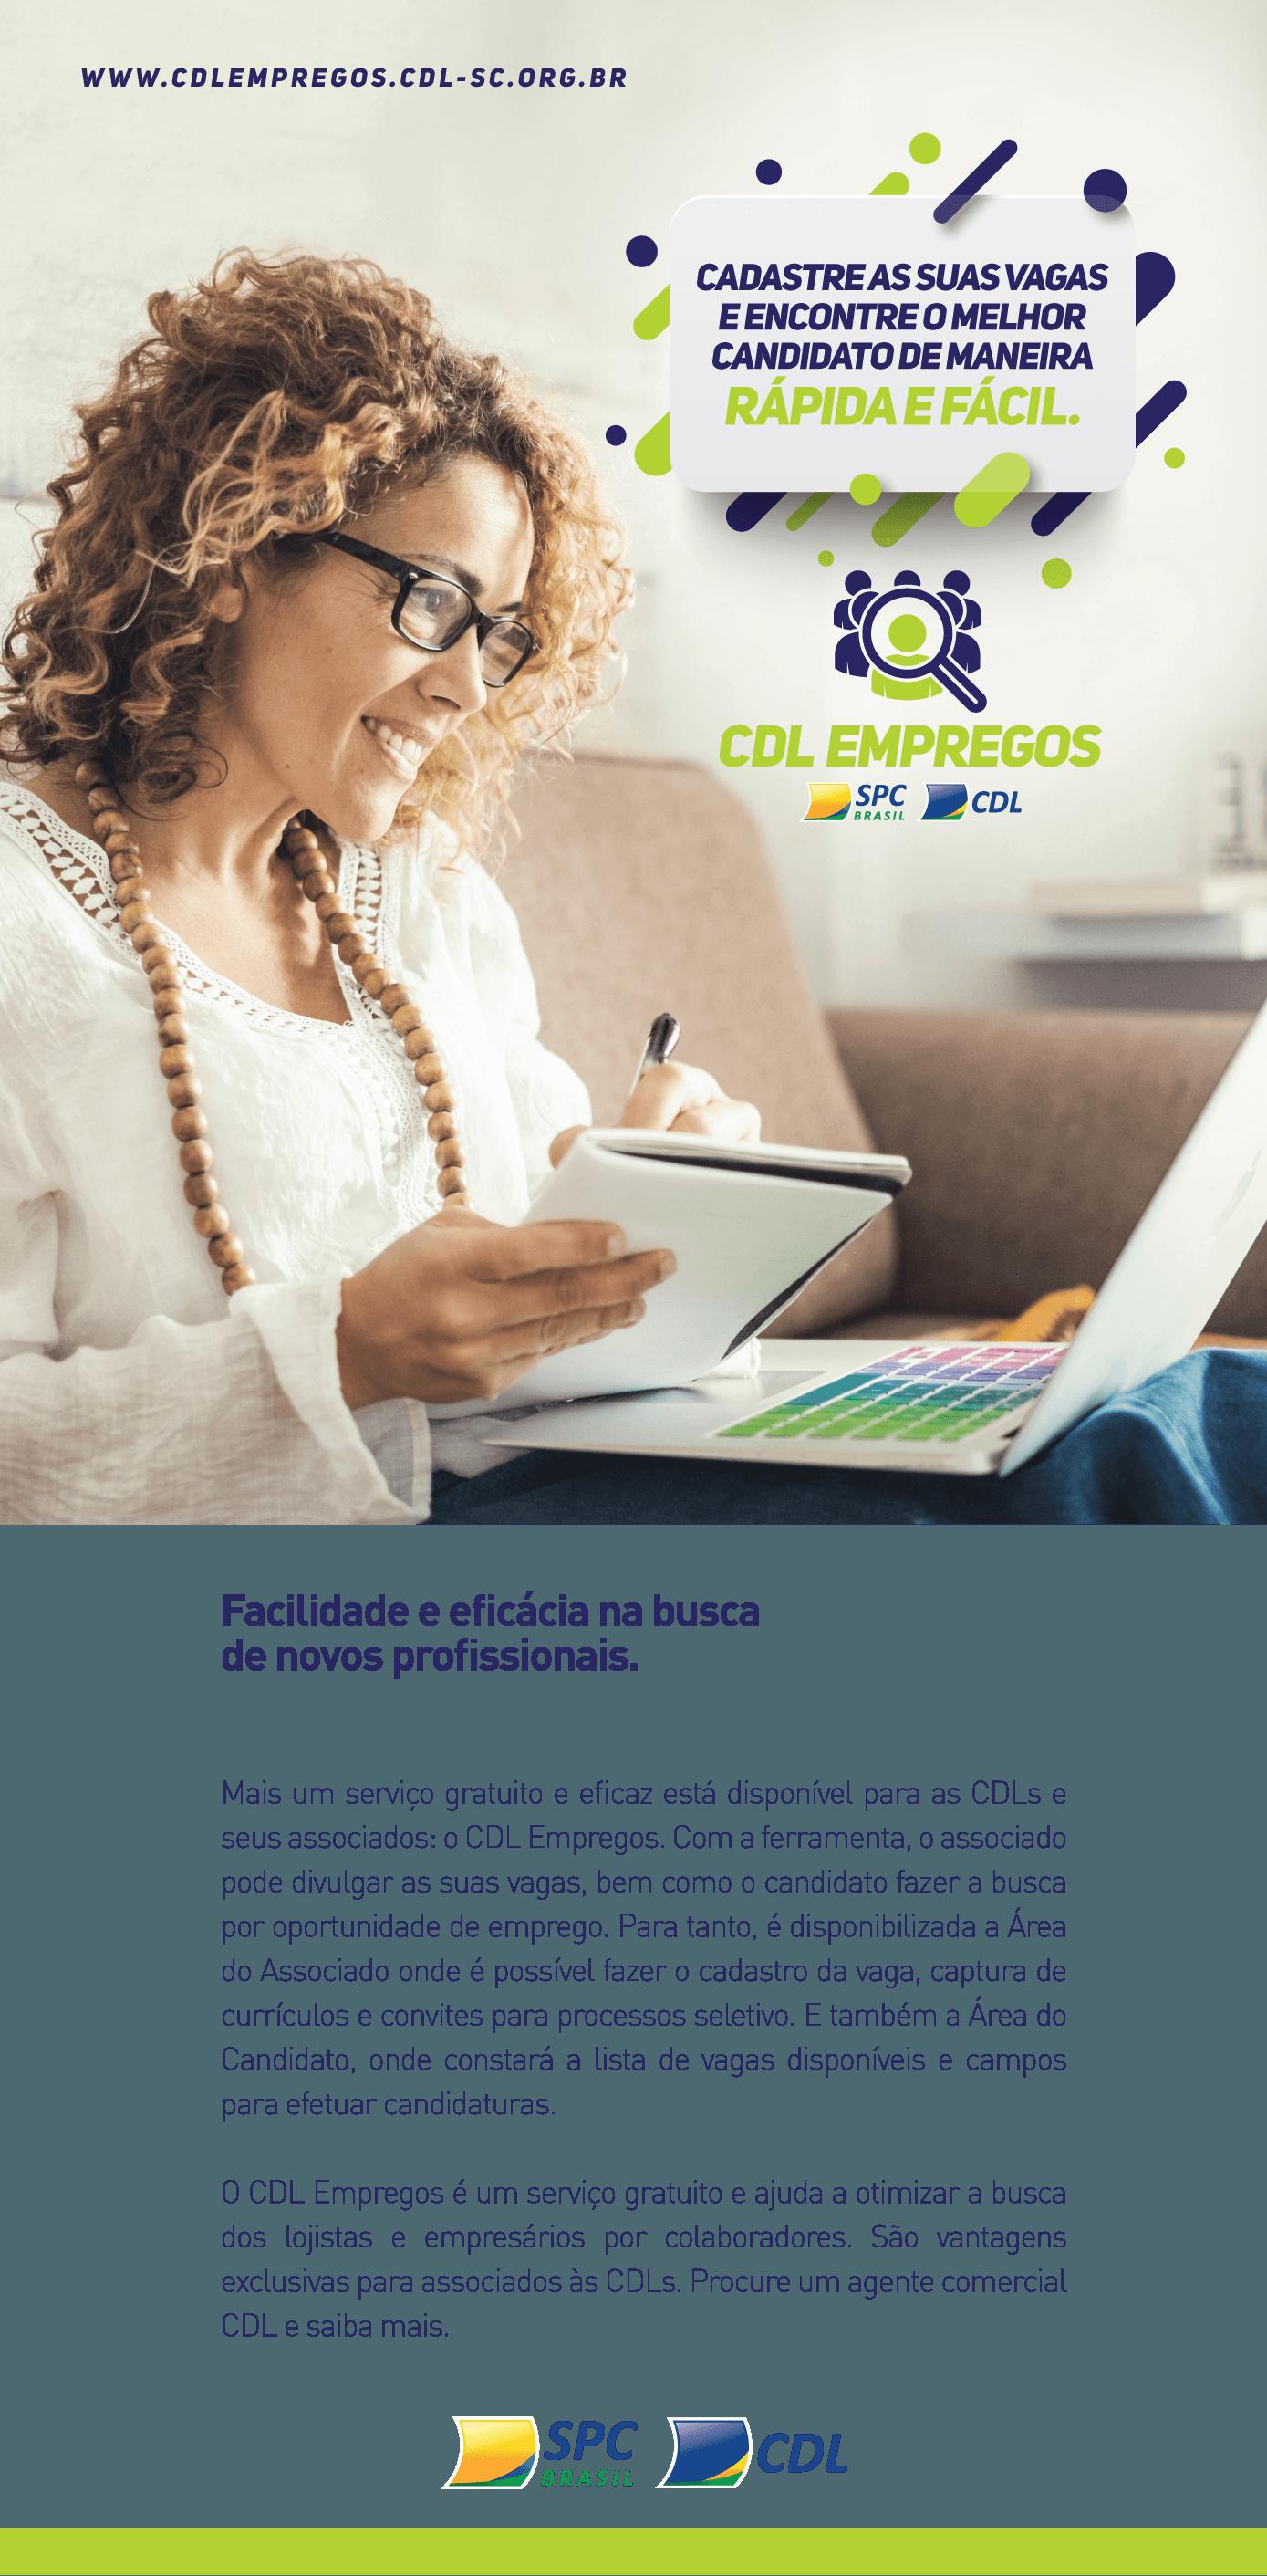 CDL Empregos | FCDL